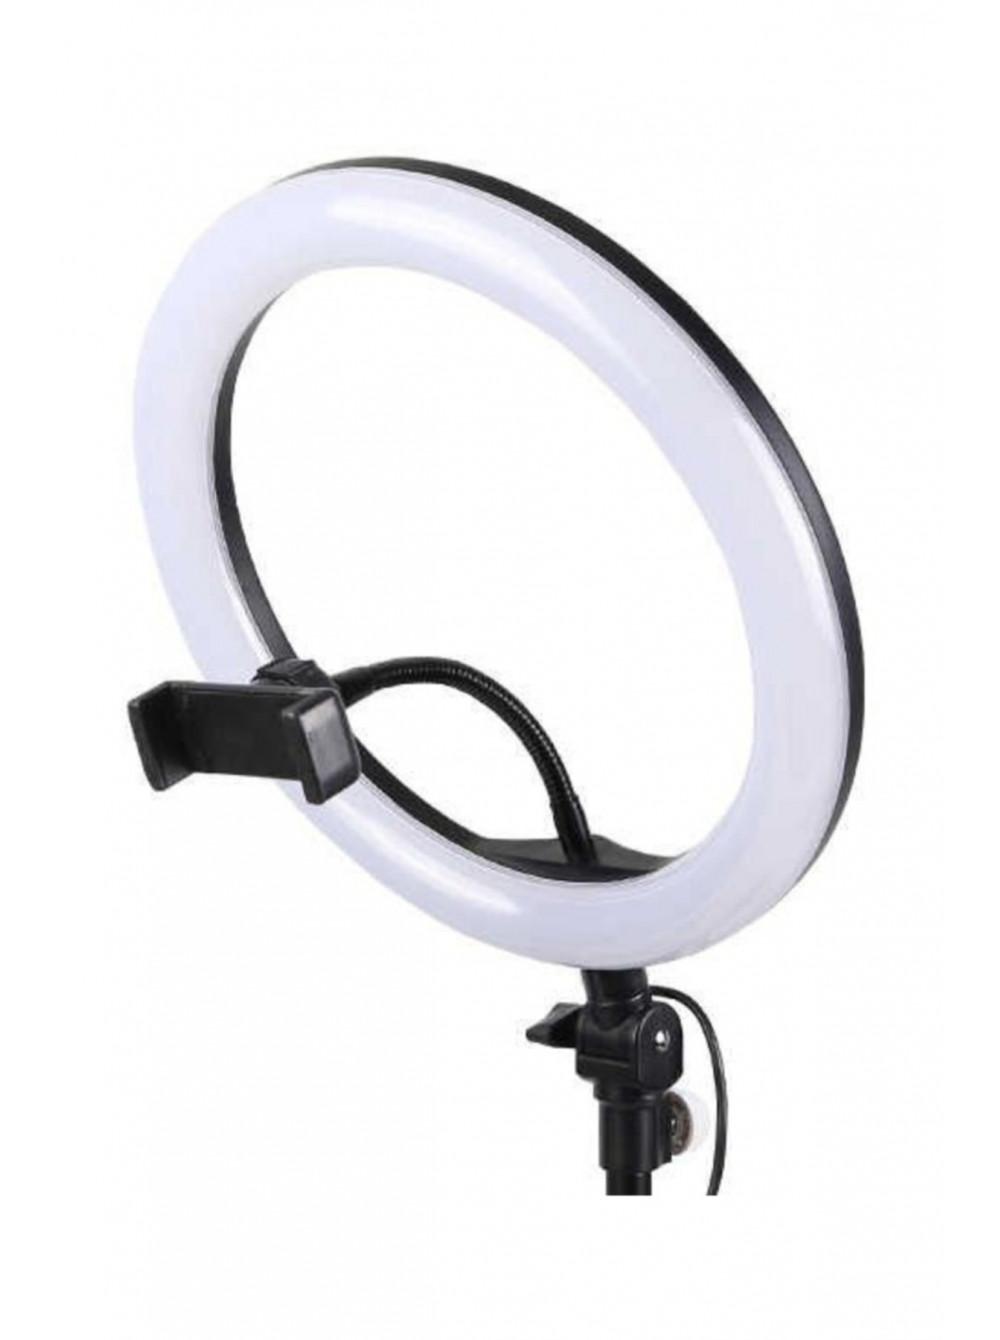 Кольцевая USB Led лампа 26см + штатив + bluetooth пульт